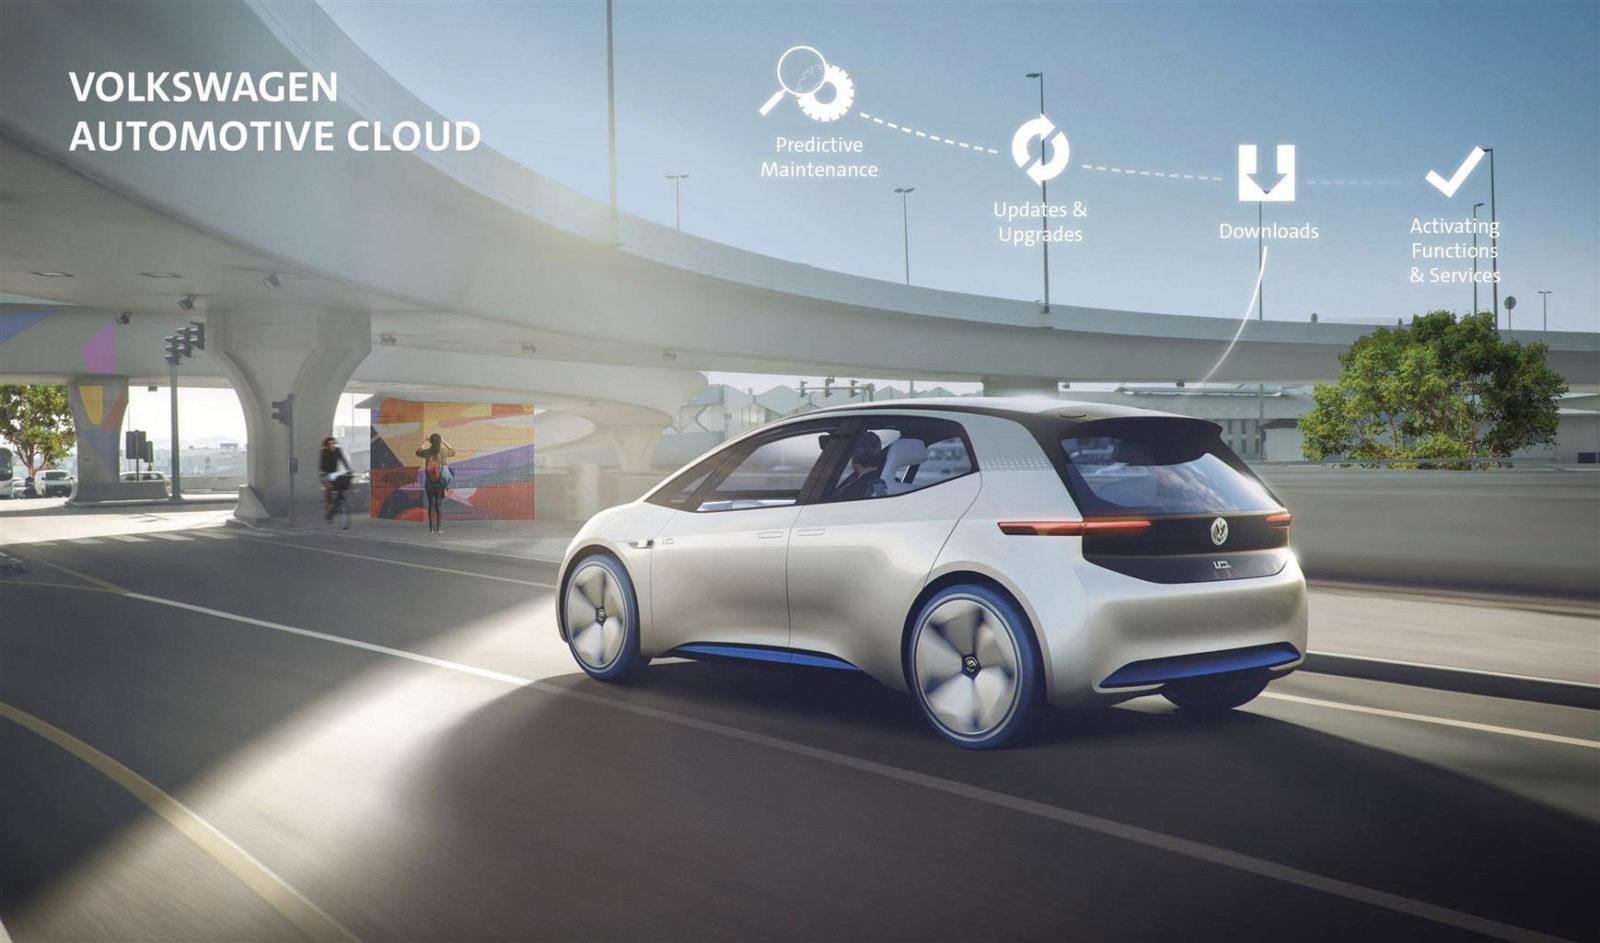 Automotive Cloud